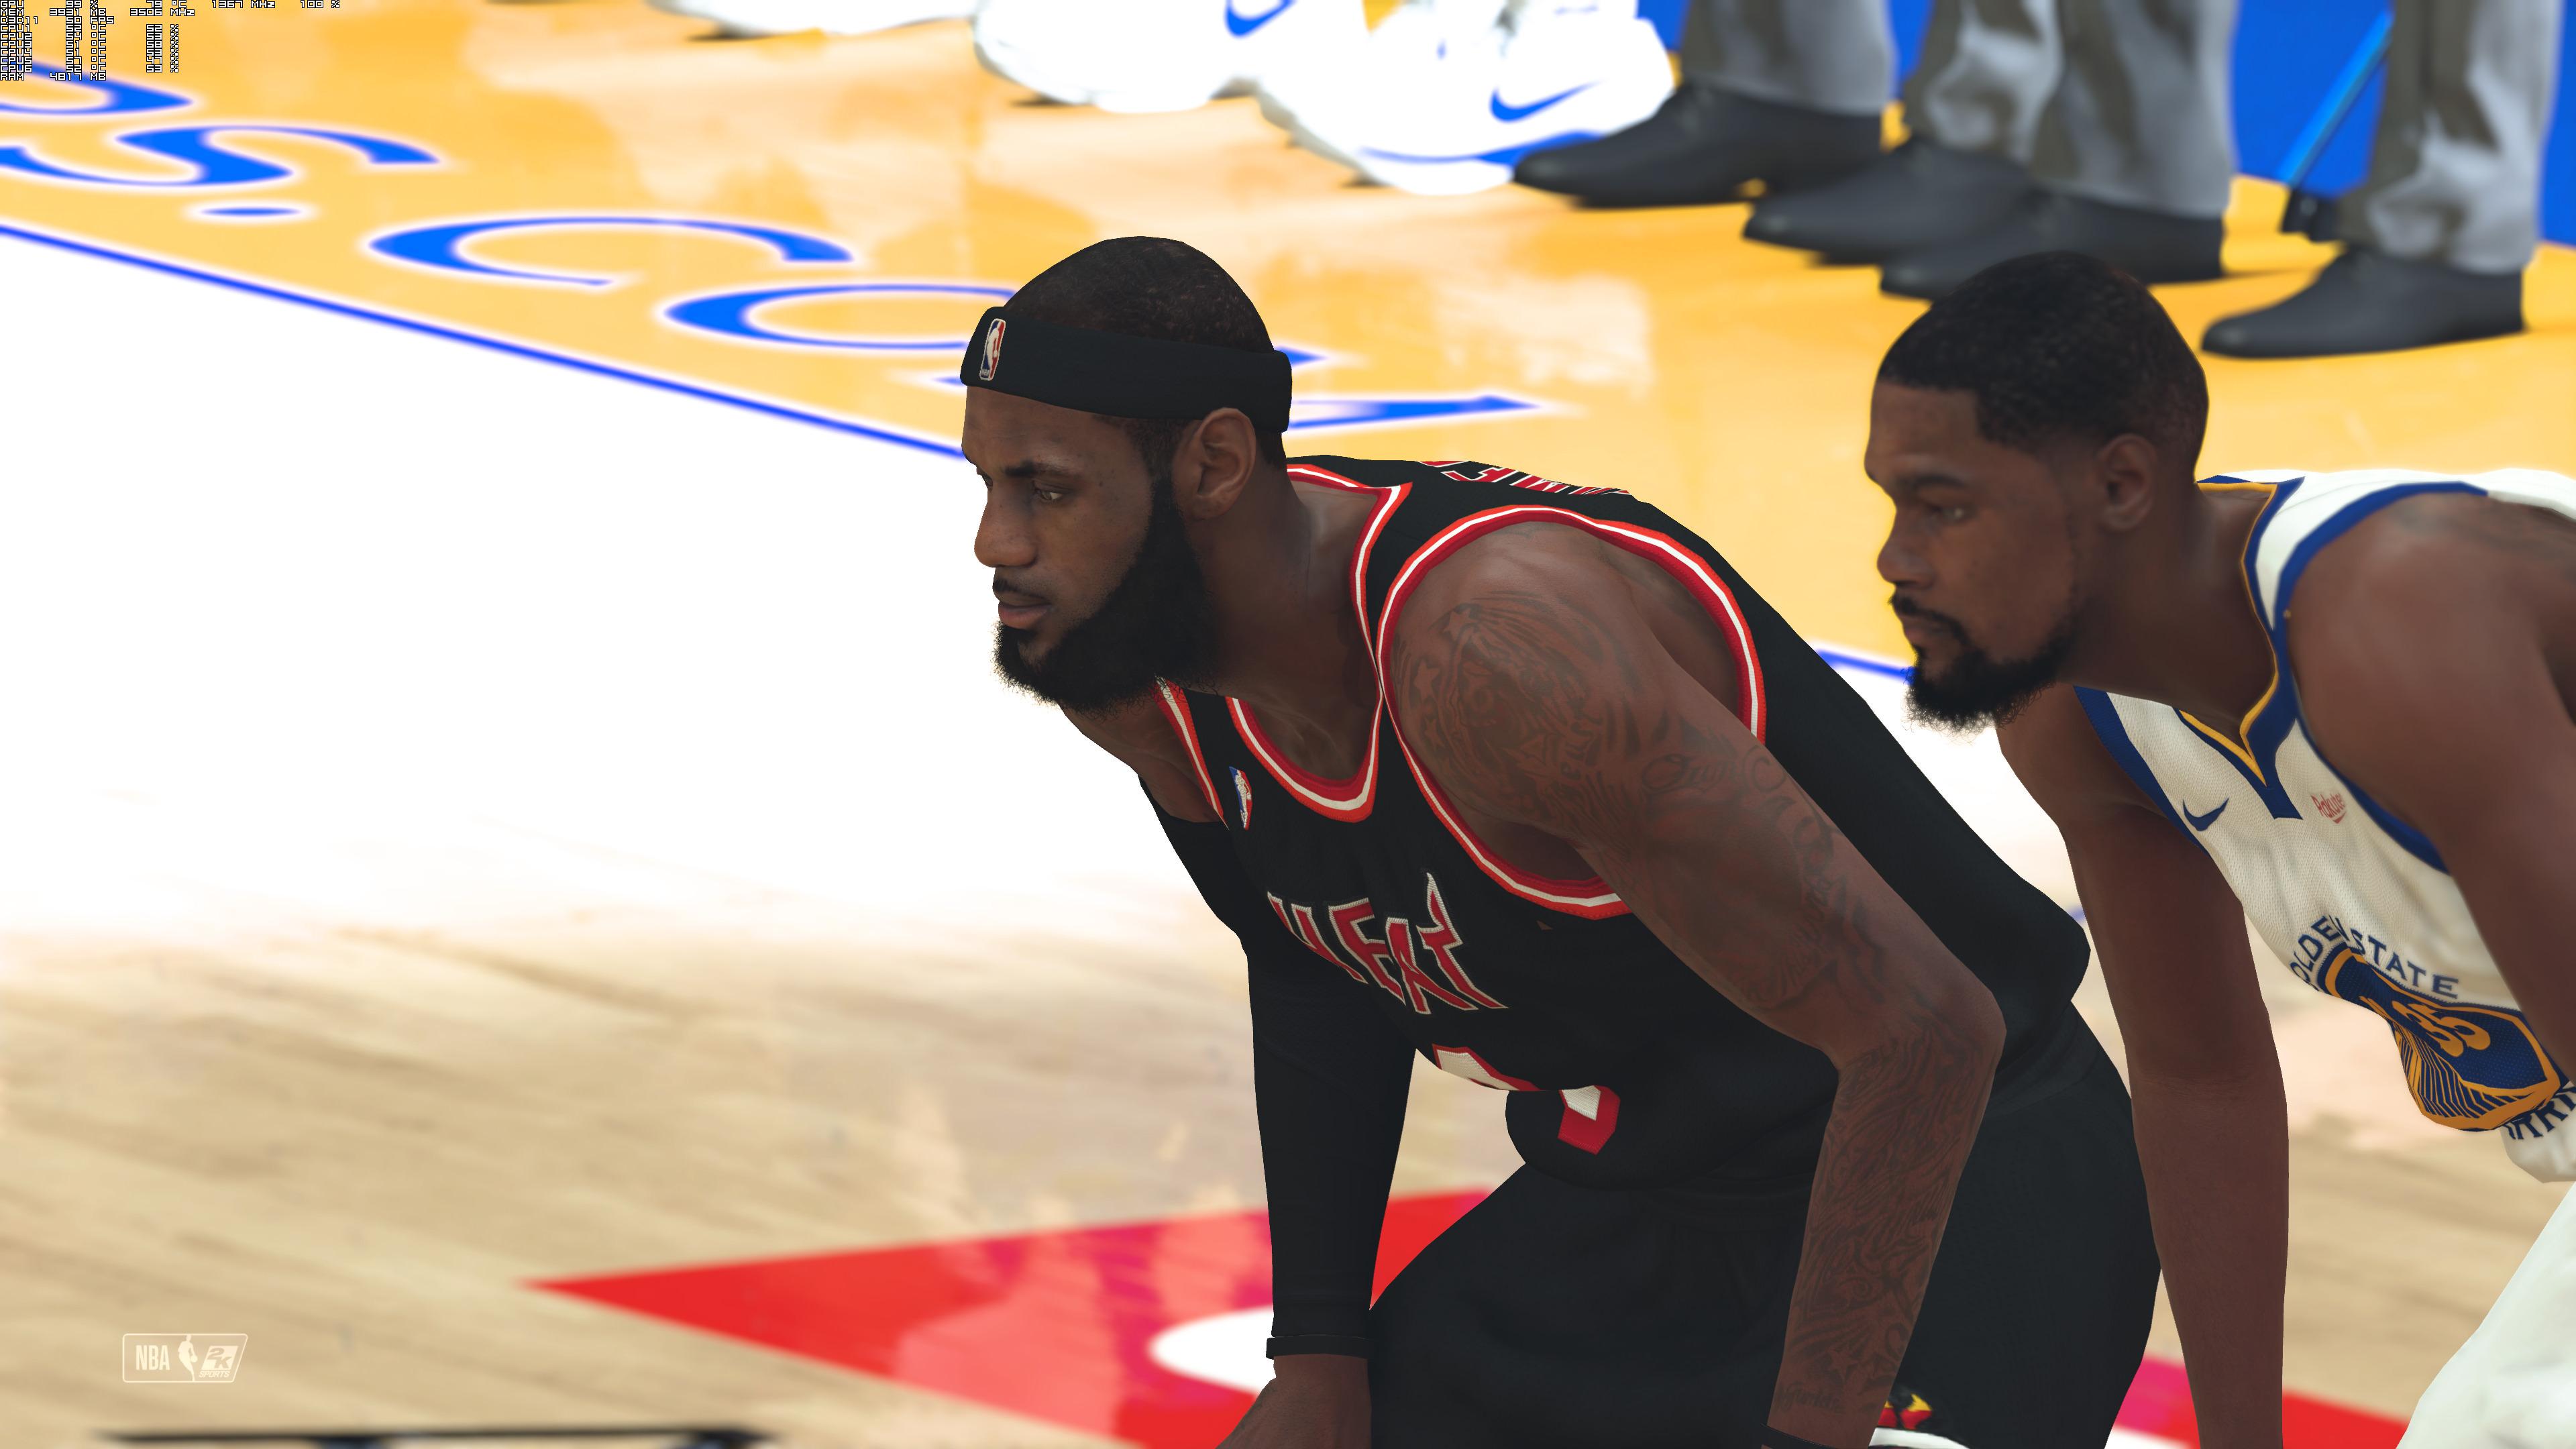 NBA 2K19 - 叽咪叽咪 | 游戏评测